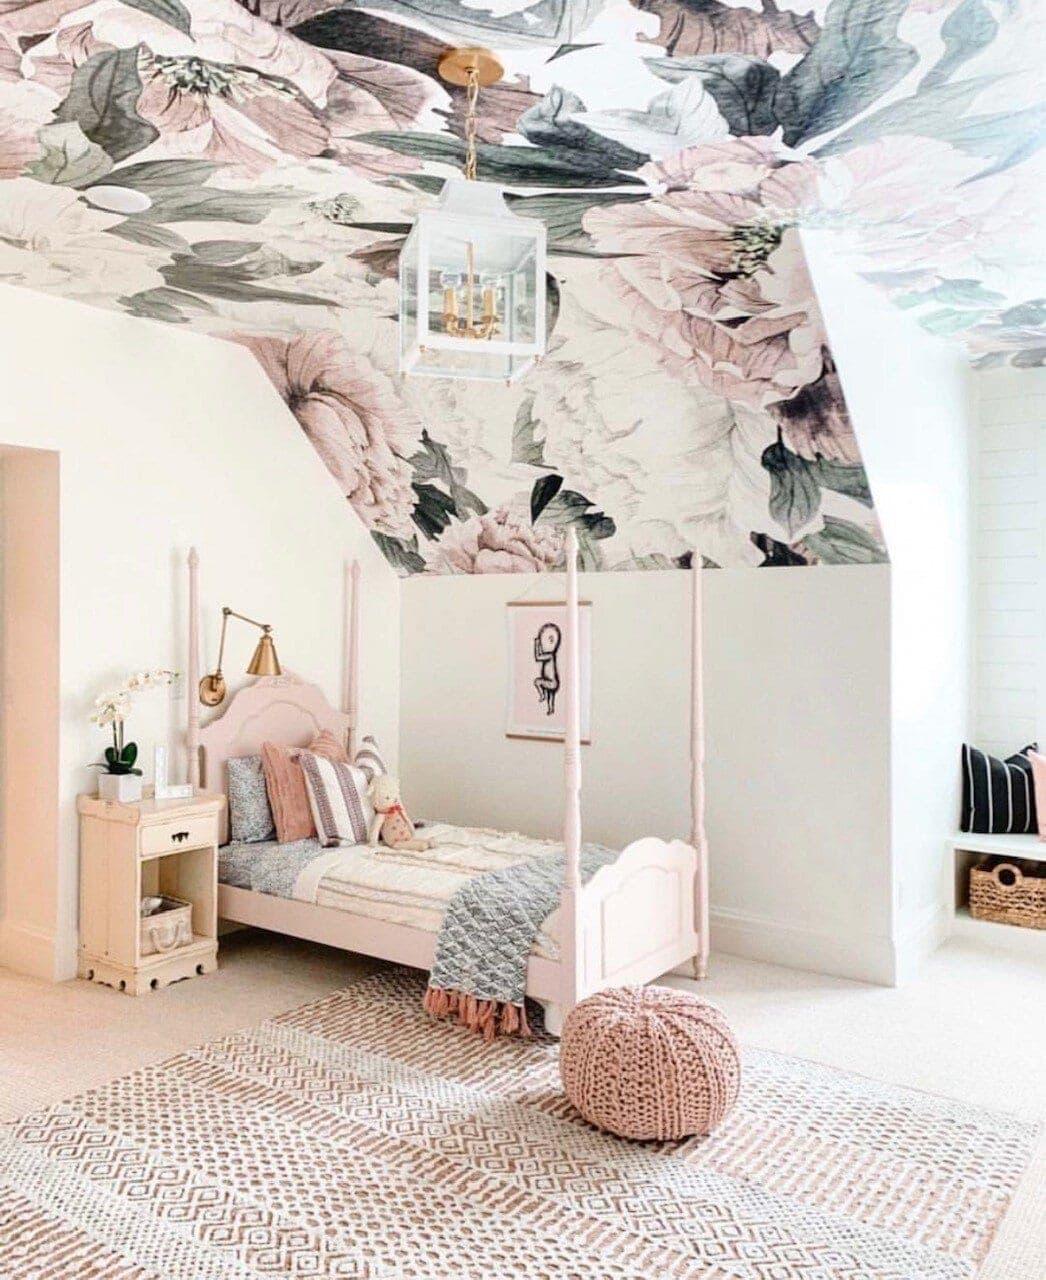 The most wonderful nursery with  anewalldecor,com  wallpaper Image Credit:  @remingtonavenue